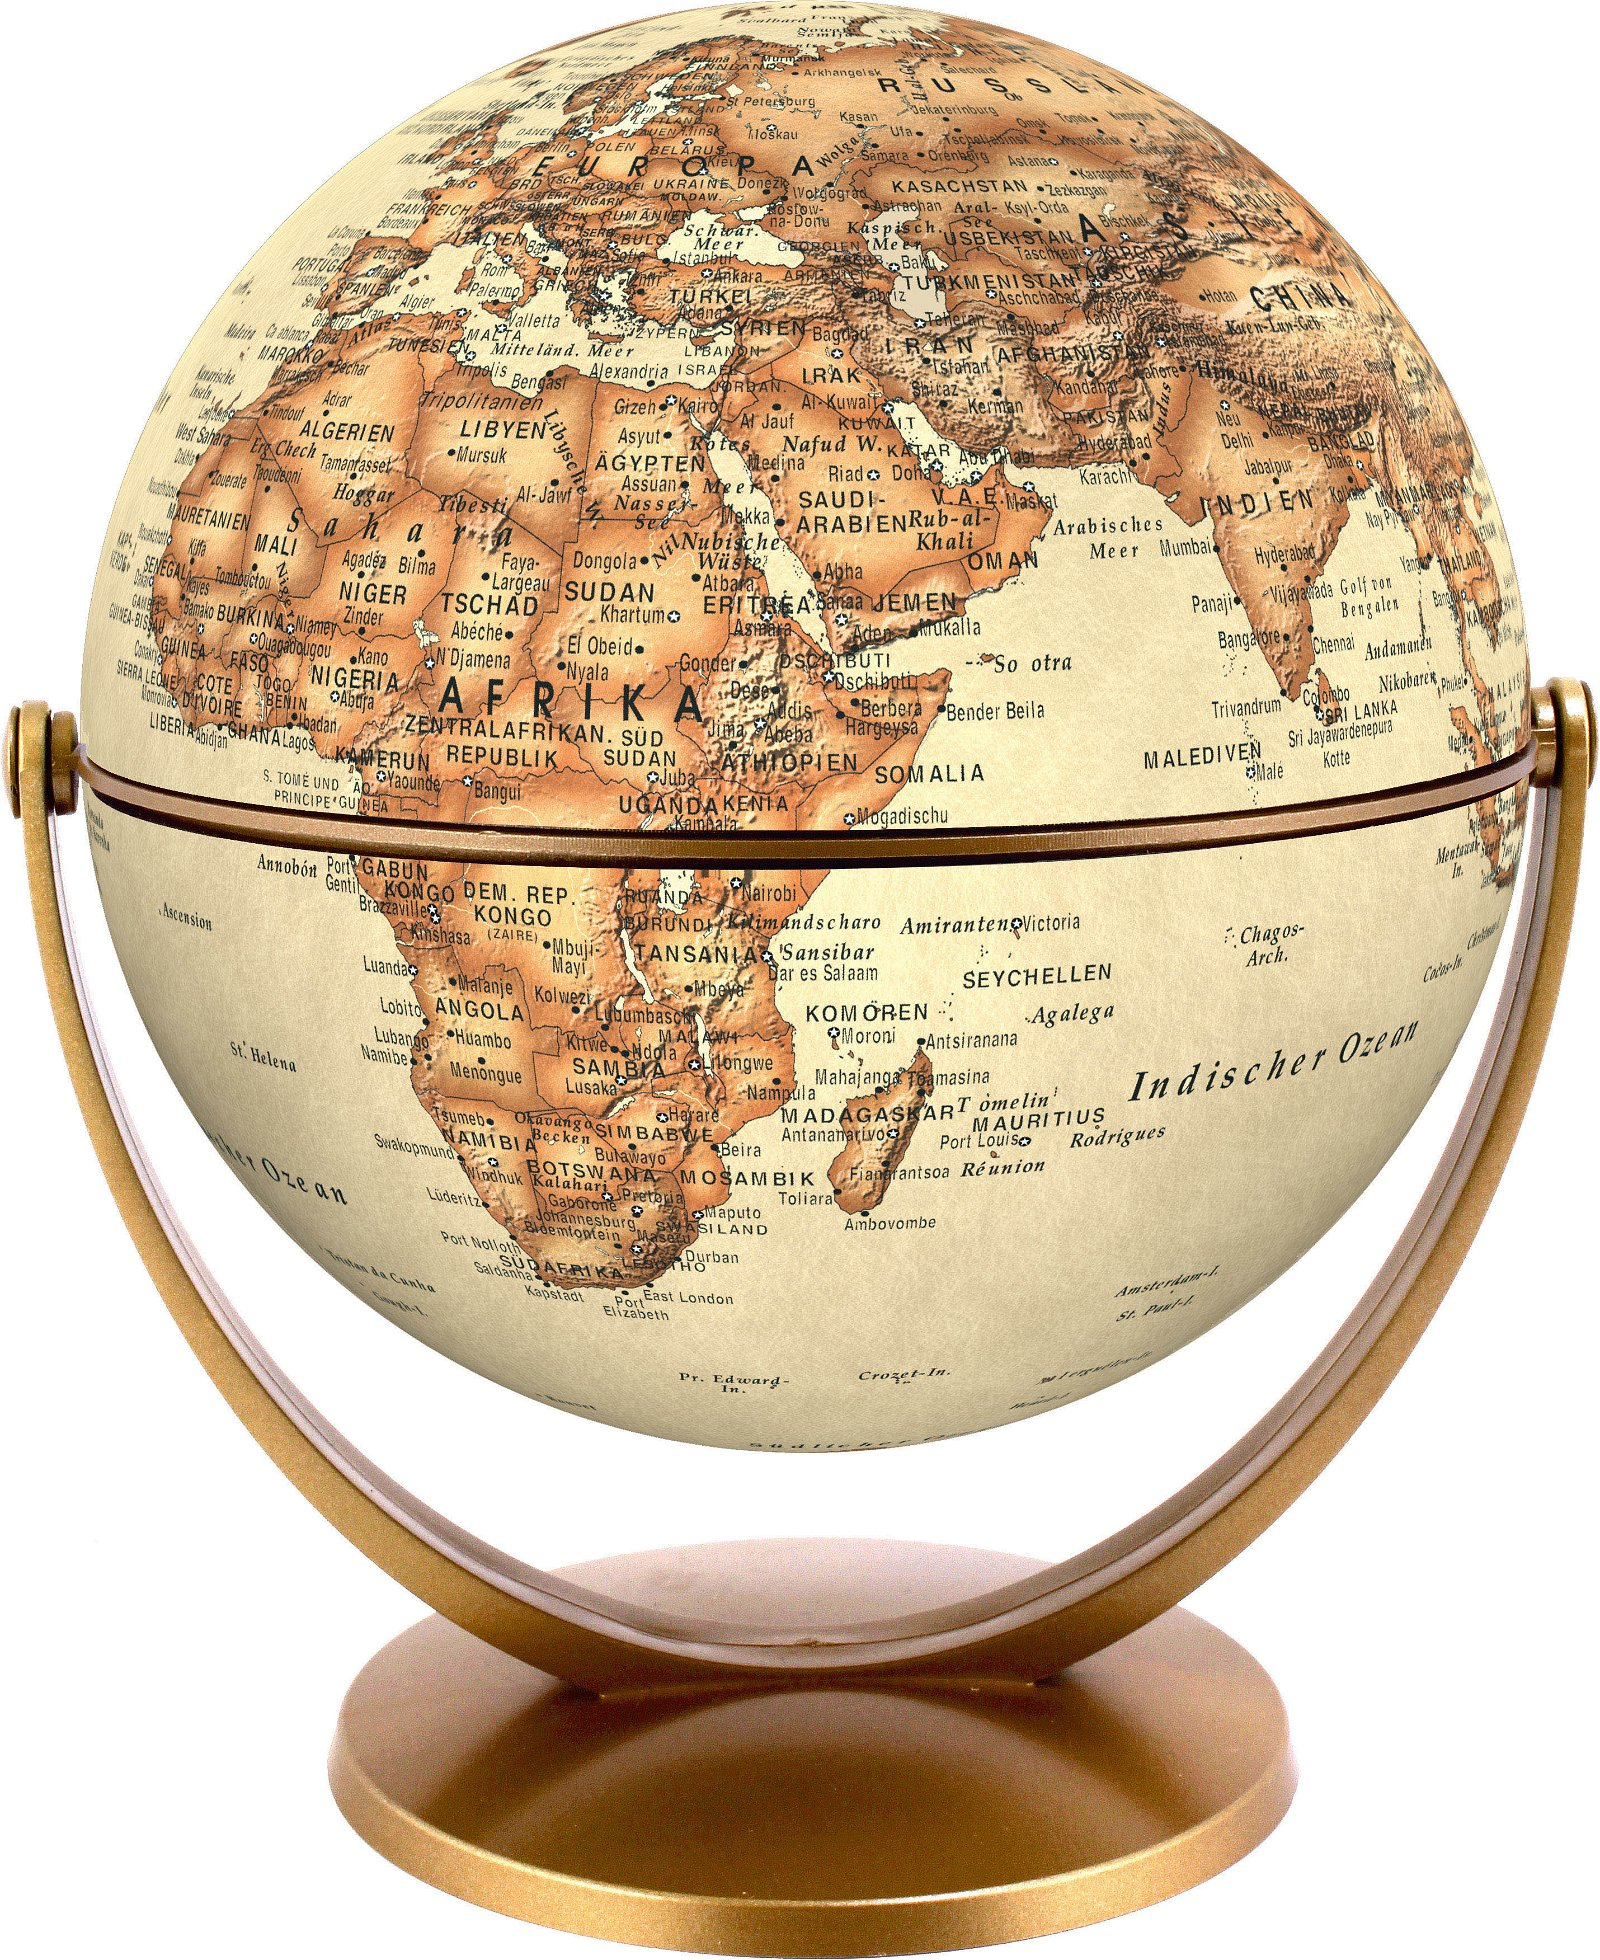 Draai & Kantelglobe 15 cm klassiek 4028465940170  Stellanova Globes / Wereldbollen  Globes Wereld als geheel